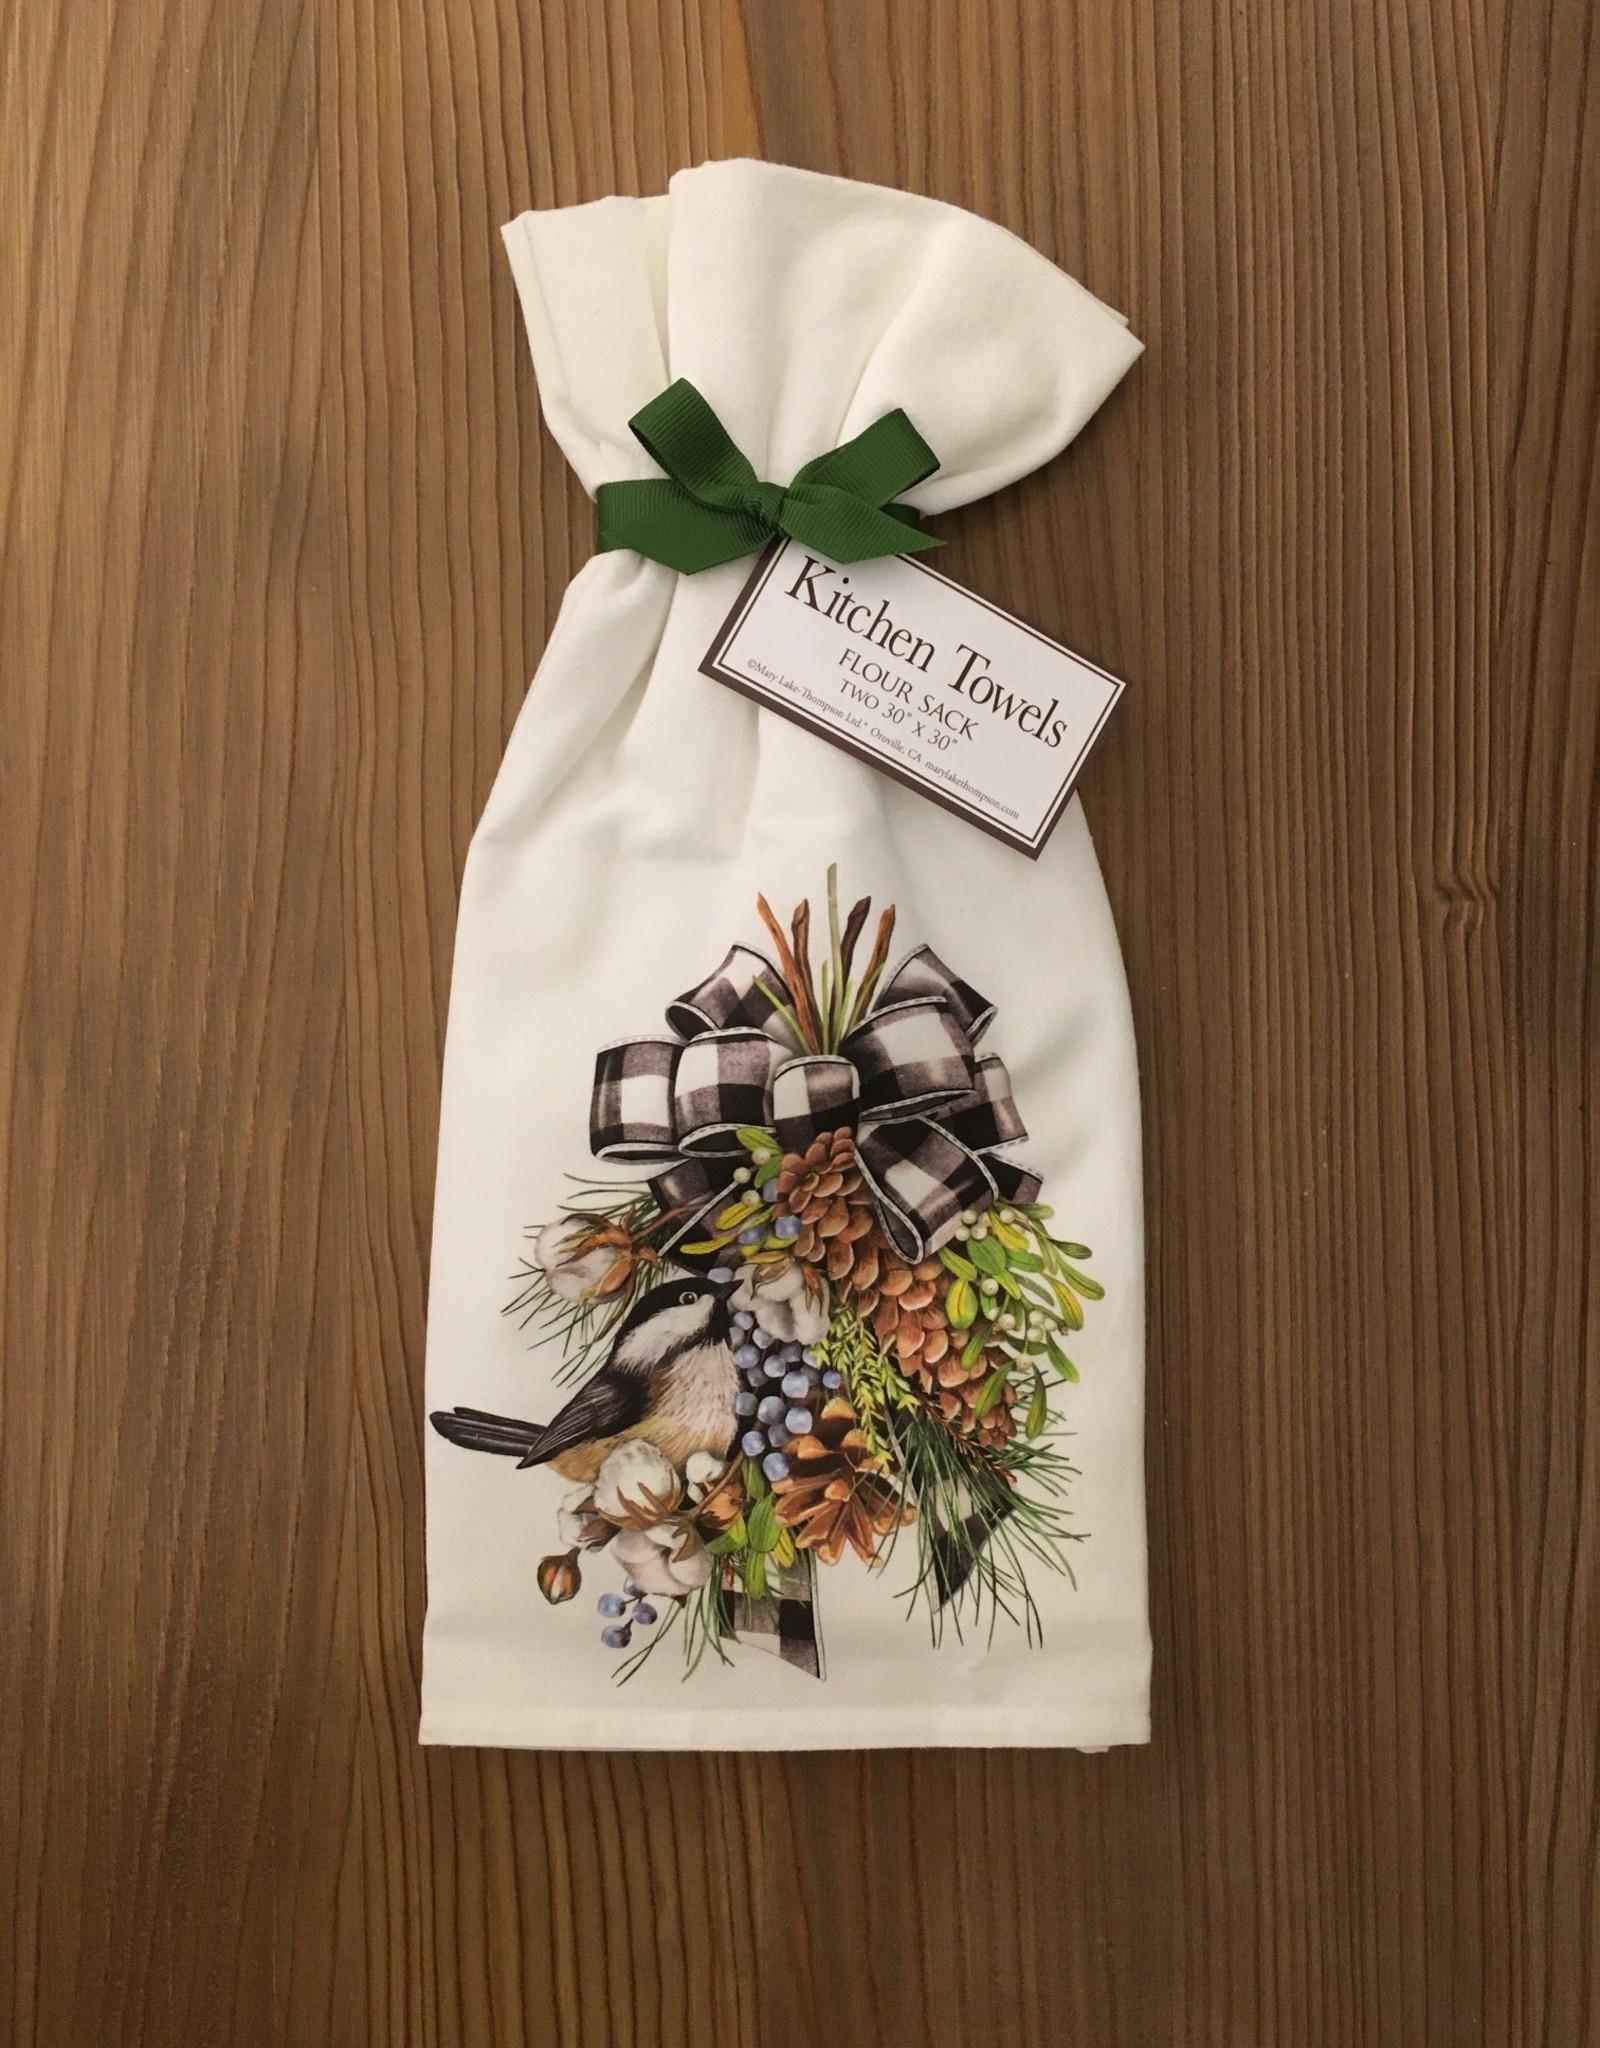 Cotton Pine Swag Towel - Set of 2